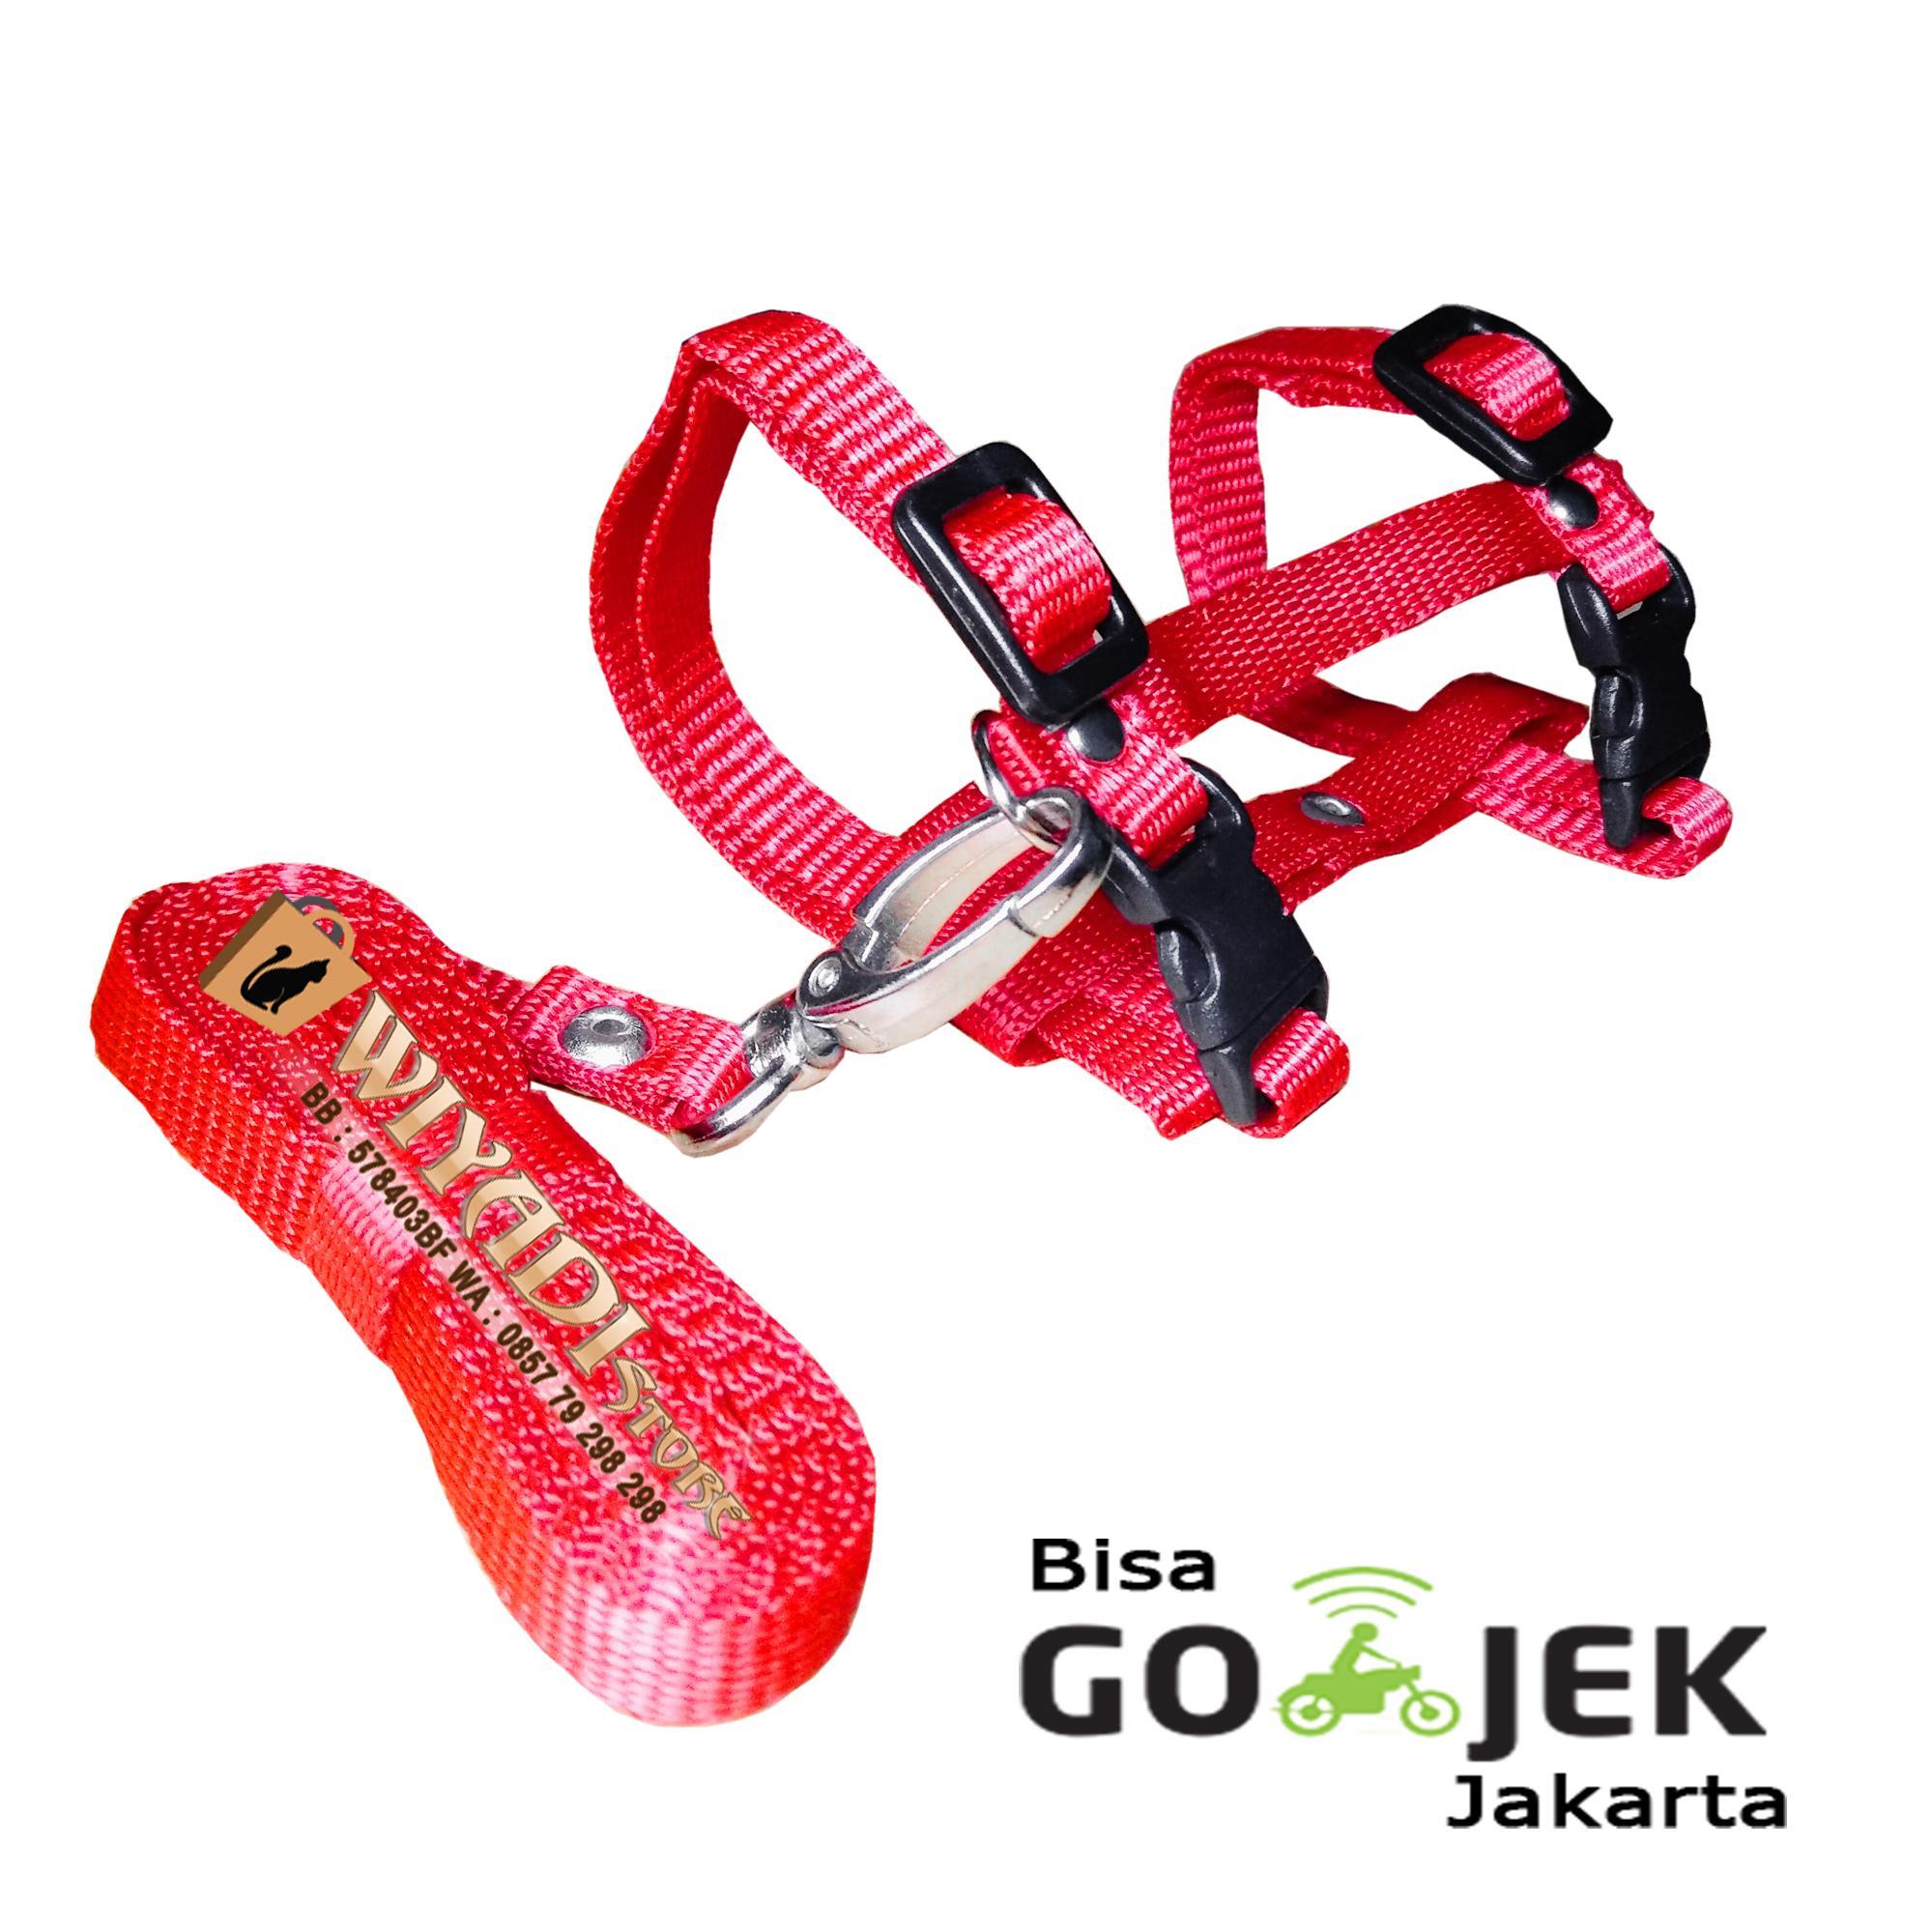 WiyadiStore - Tali Harness H Hewan Musang Kelinci kucing Iguana [Size M] - Merah